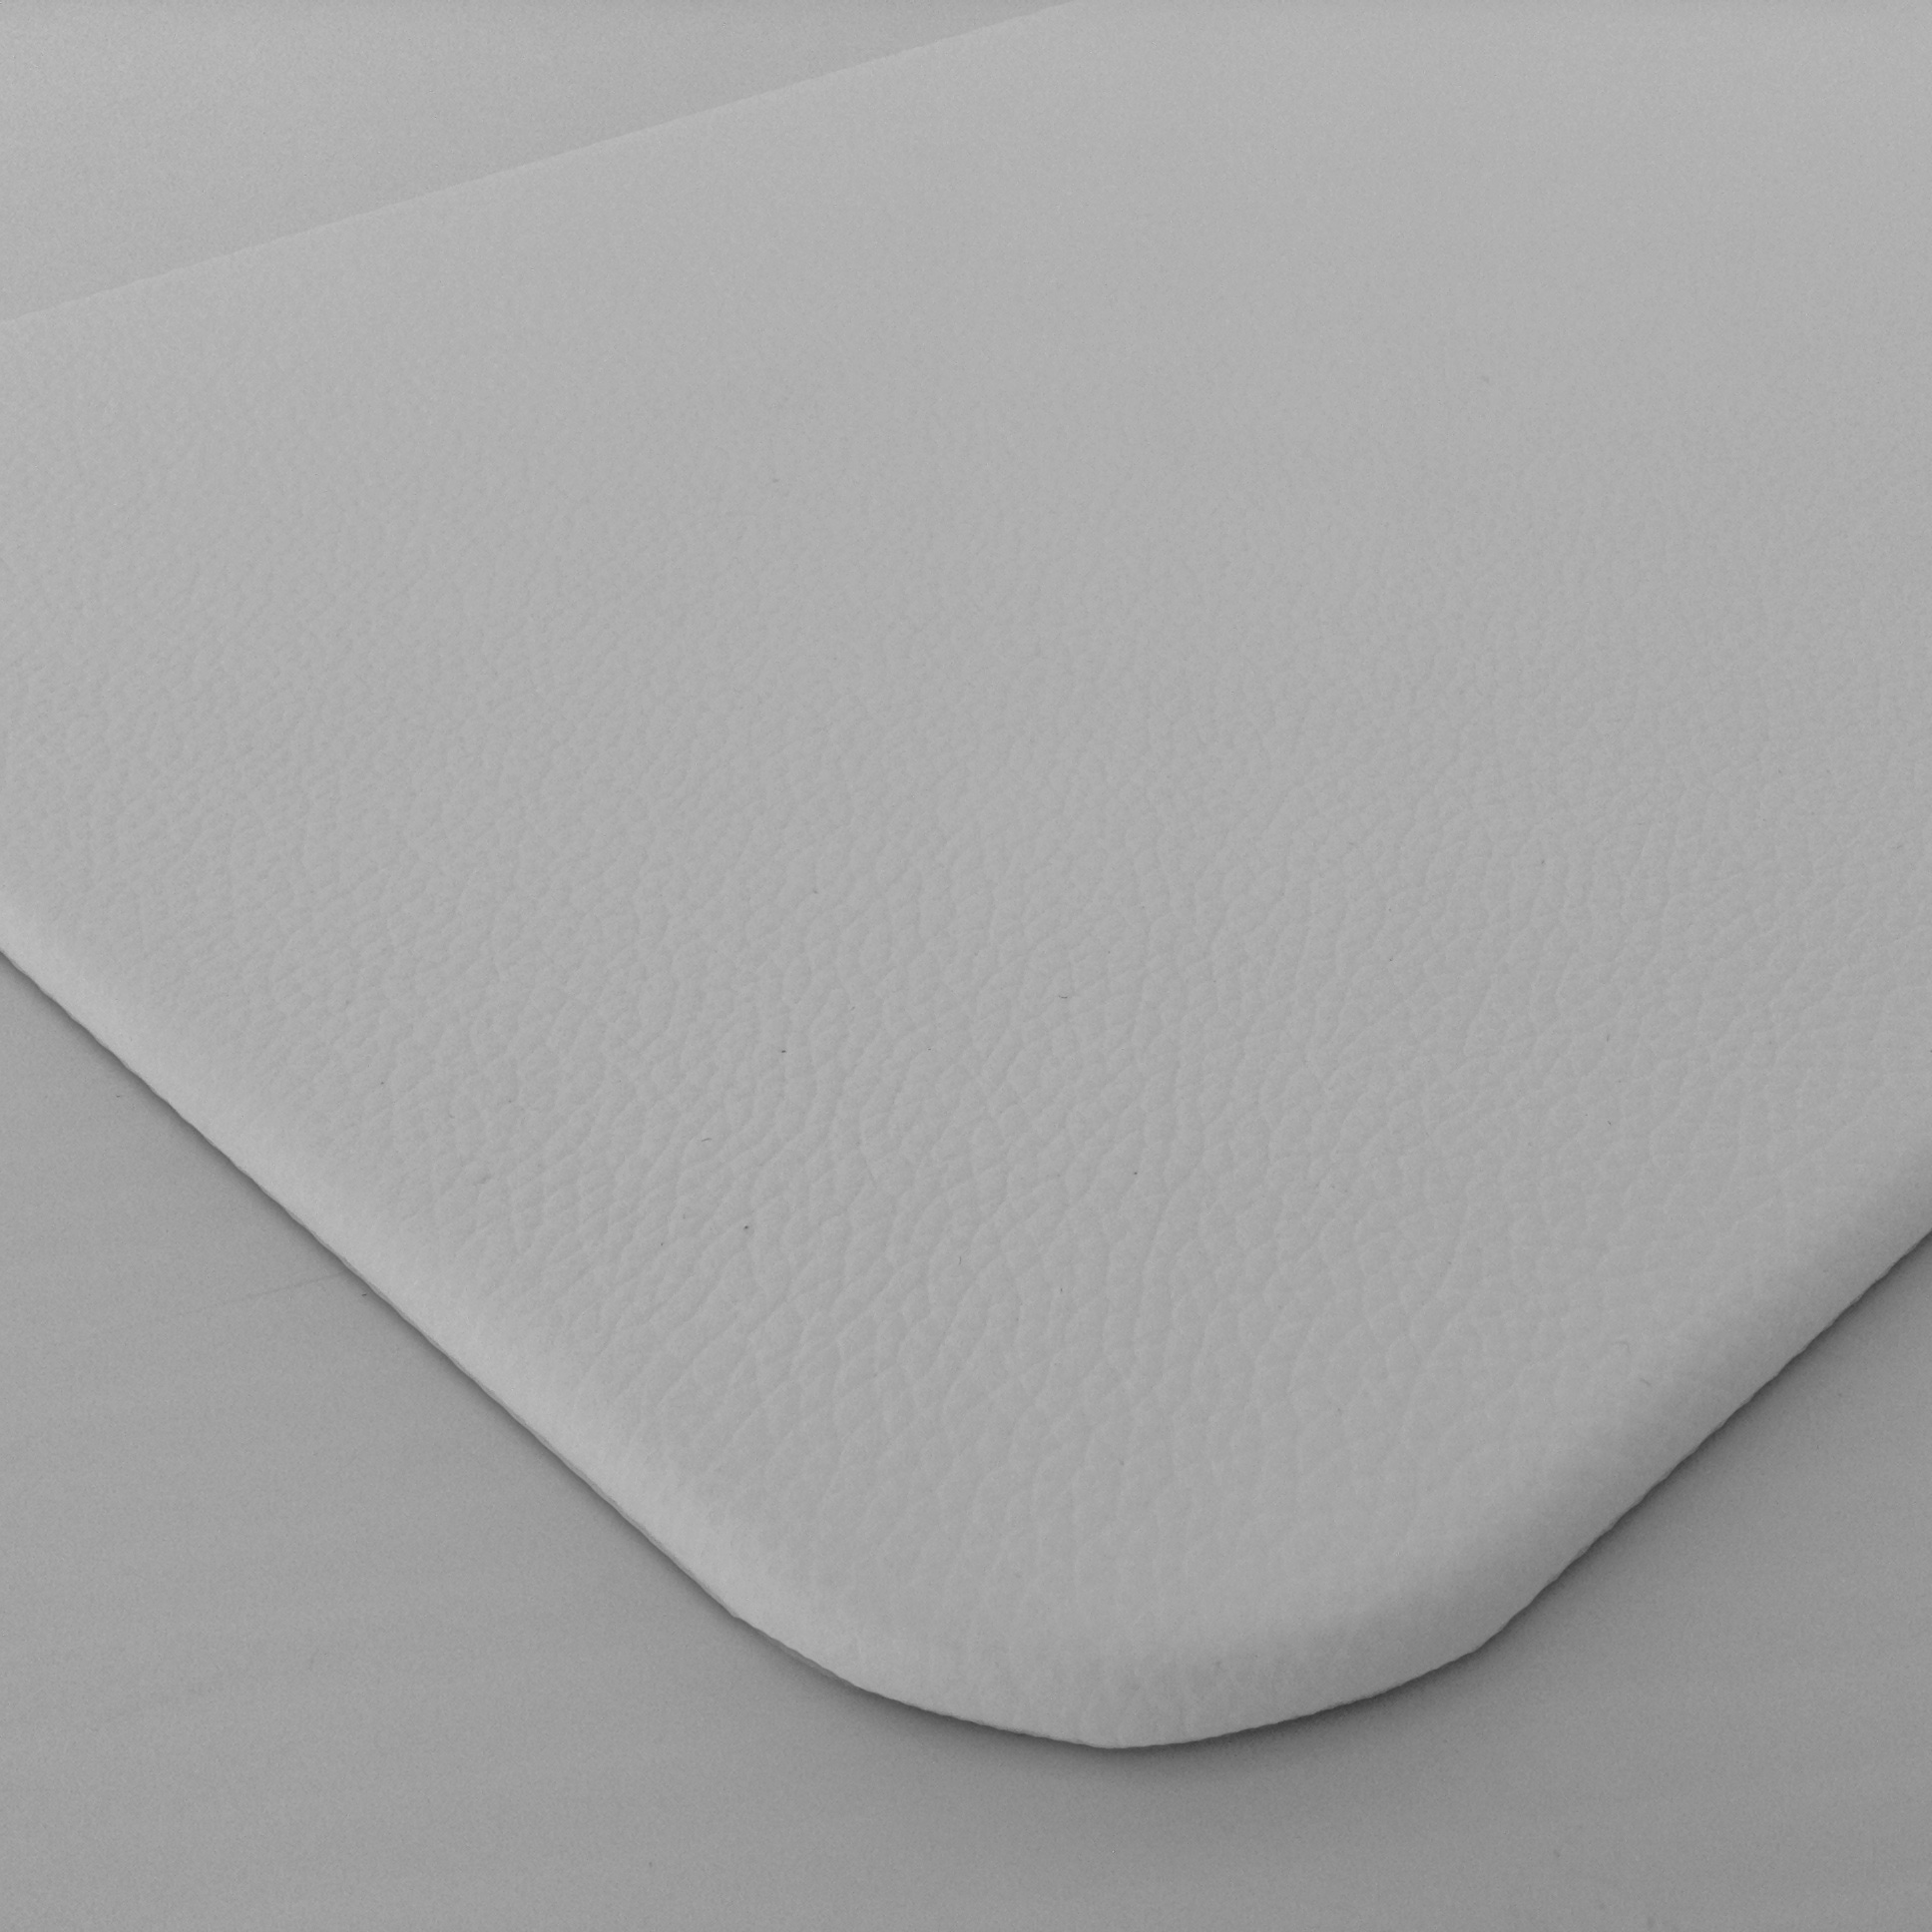 Ideal White Desk Mat - Desk Ideas VQ25